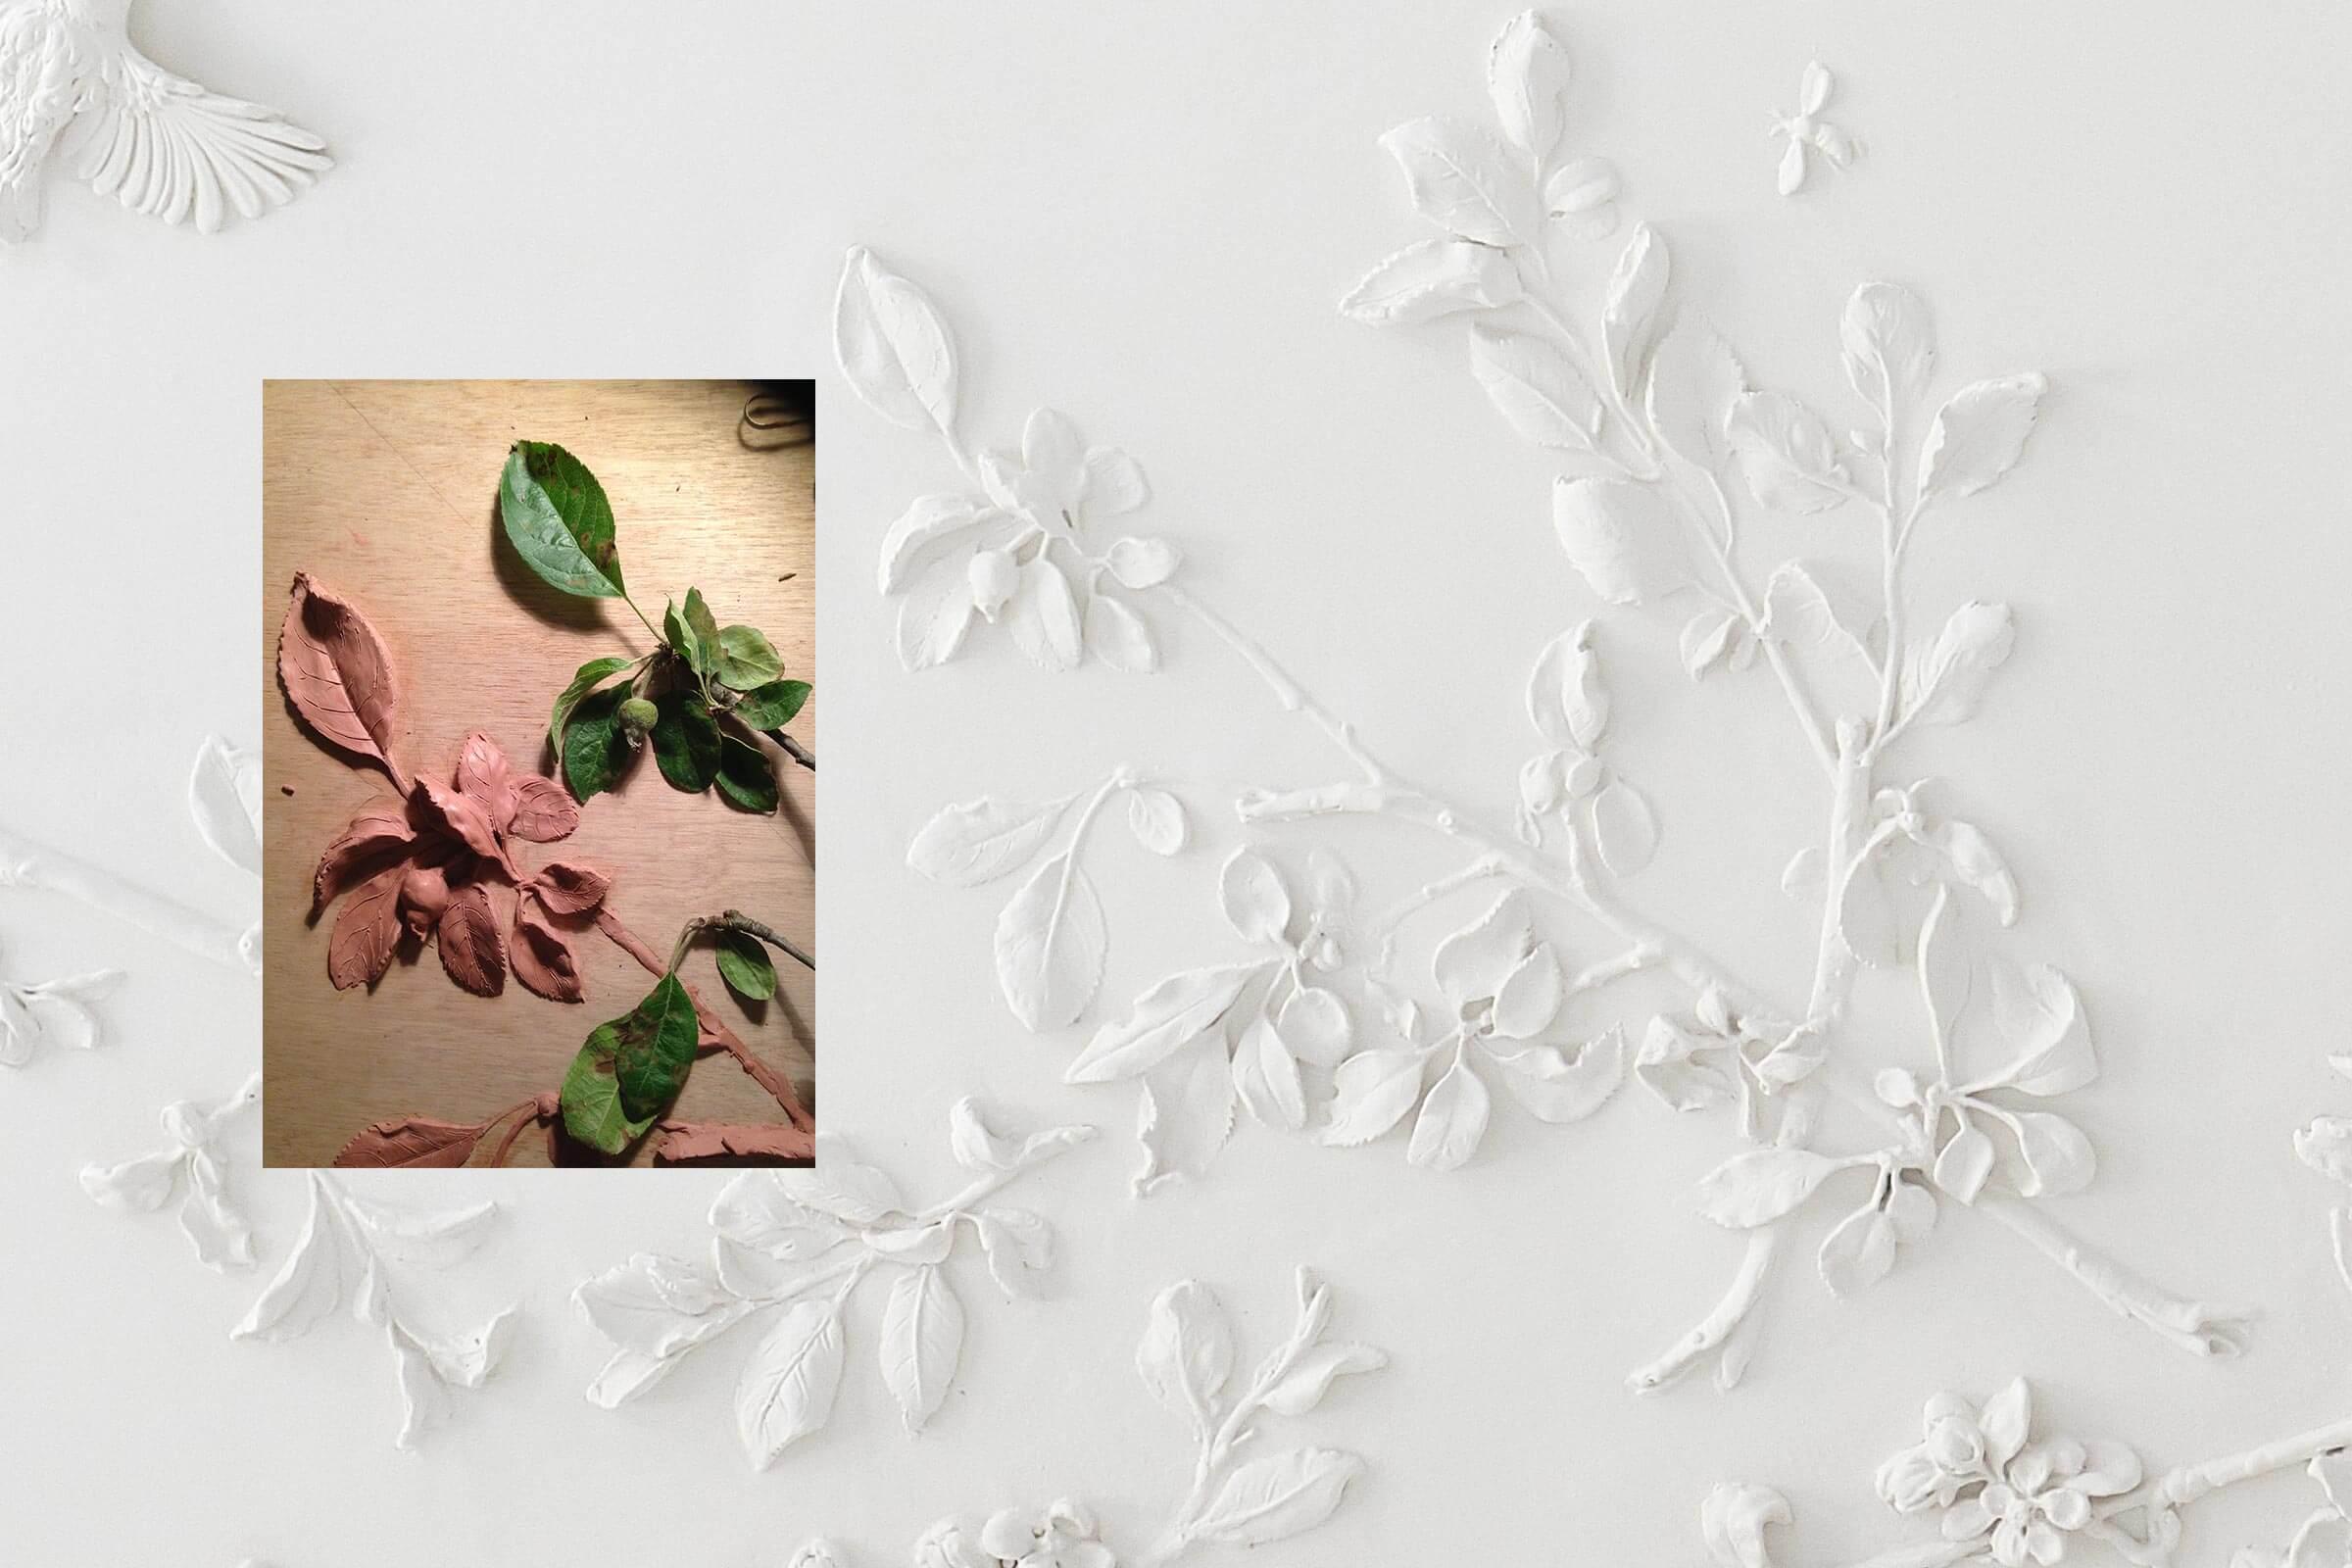 claus lind © modelling stucco worker stucco ceiling rosette stucco plaster craftsmanship